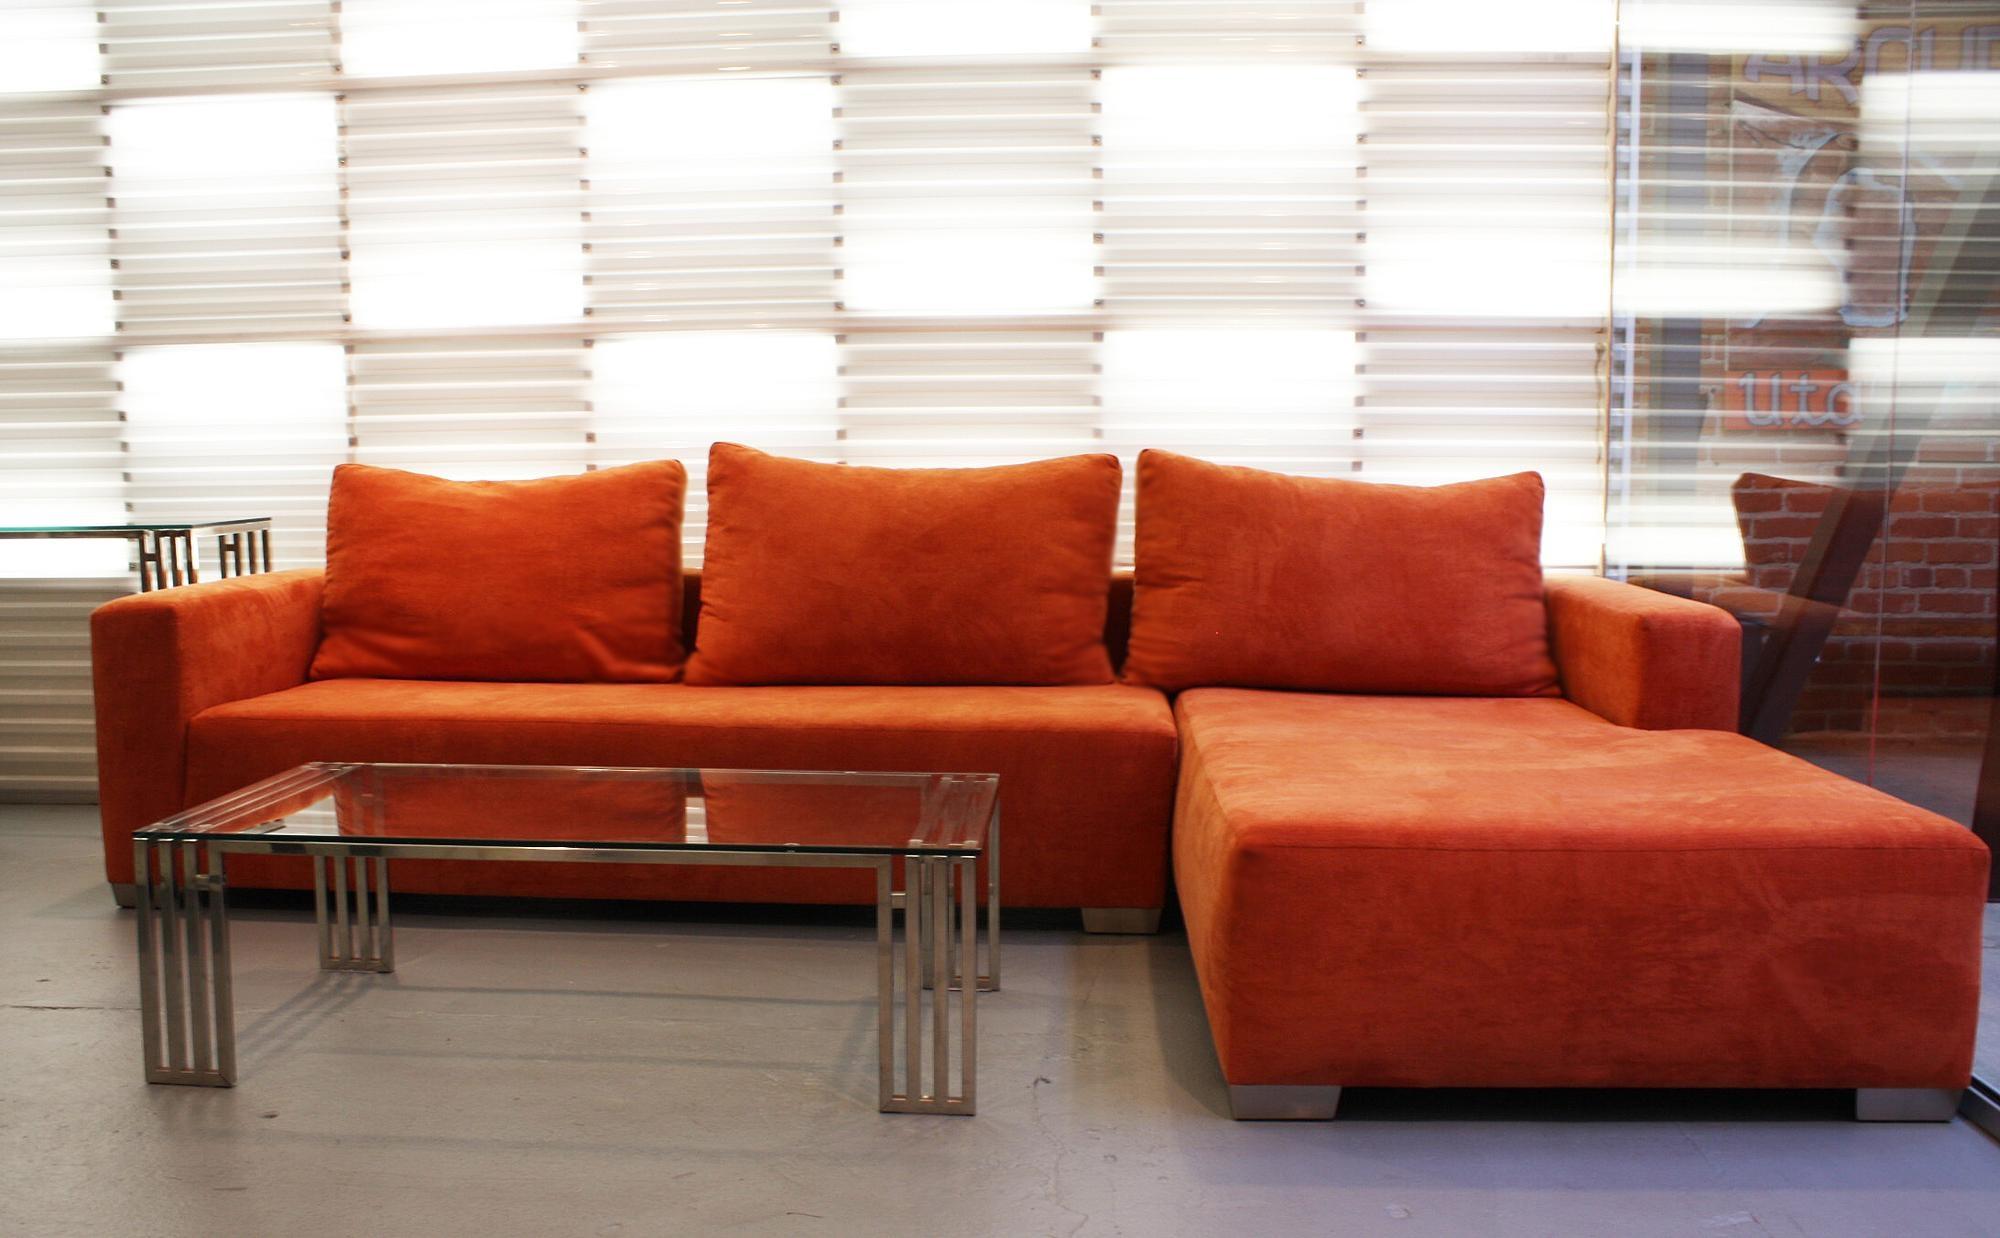 Sofas Center : Striking Orange Sectional Sofa Photos Ideas Divani Inside Orange Sectional Sofa (View 15 of 20)